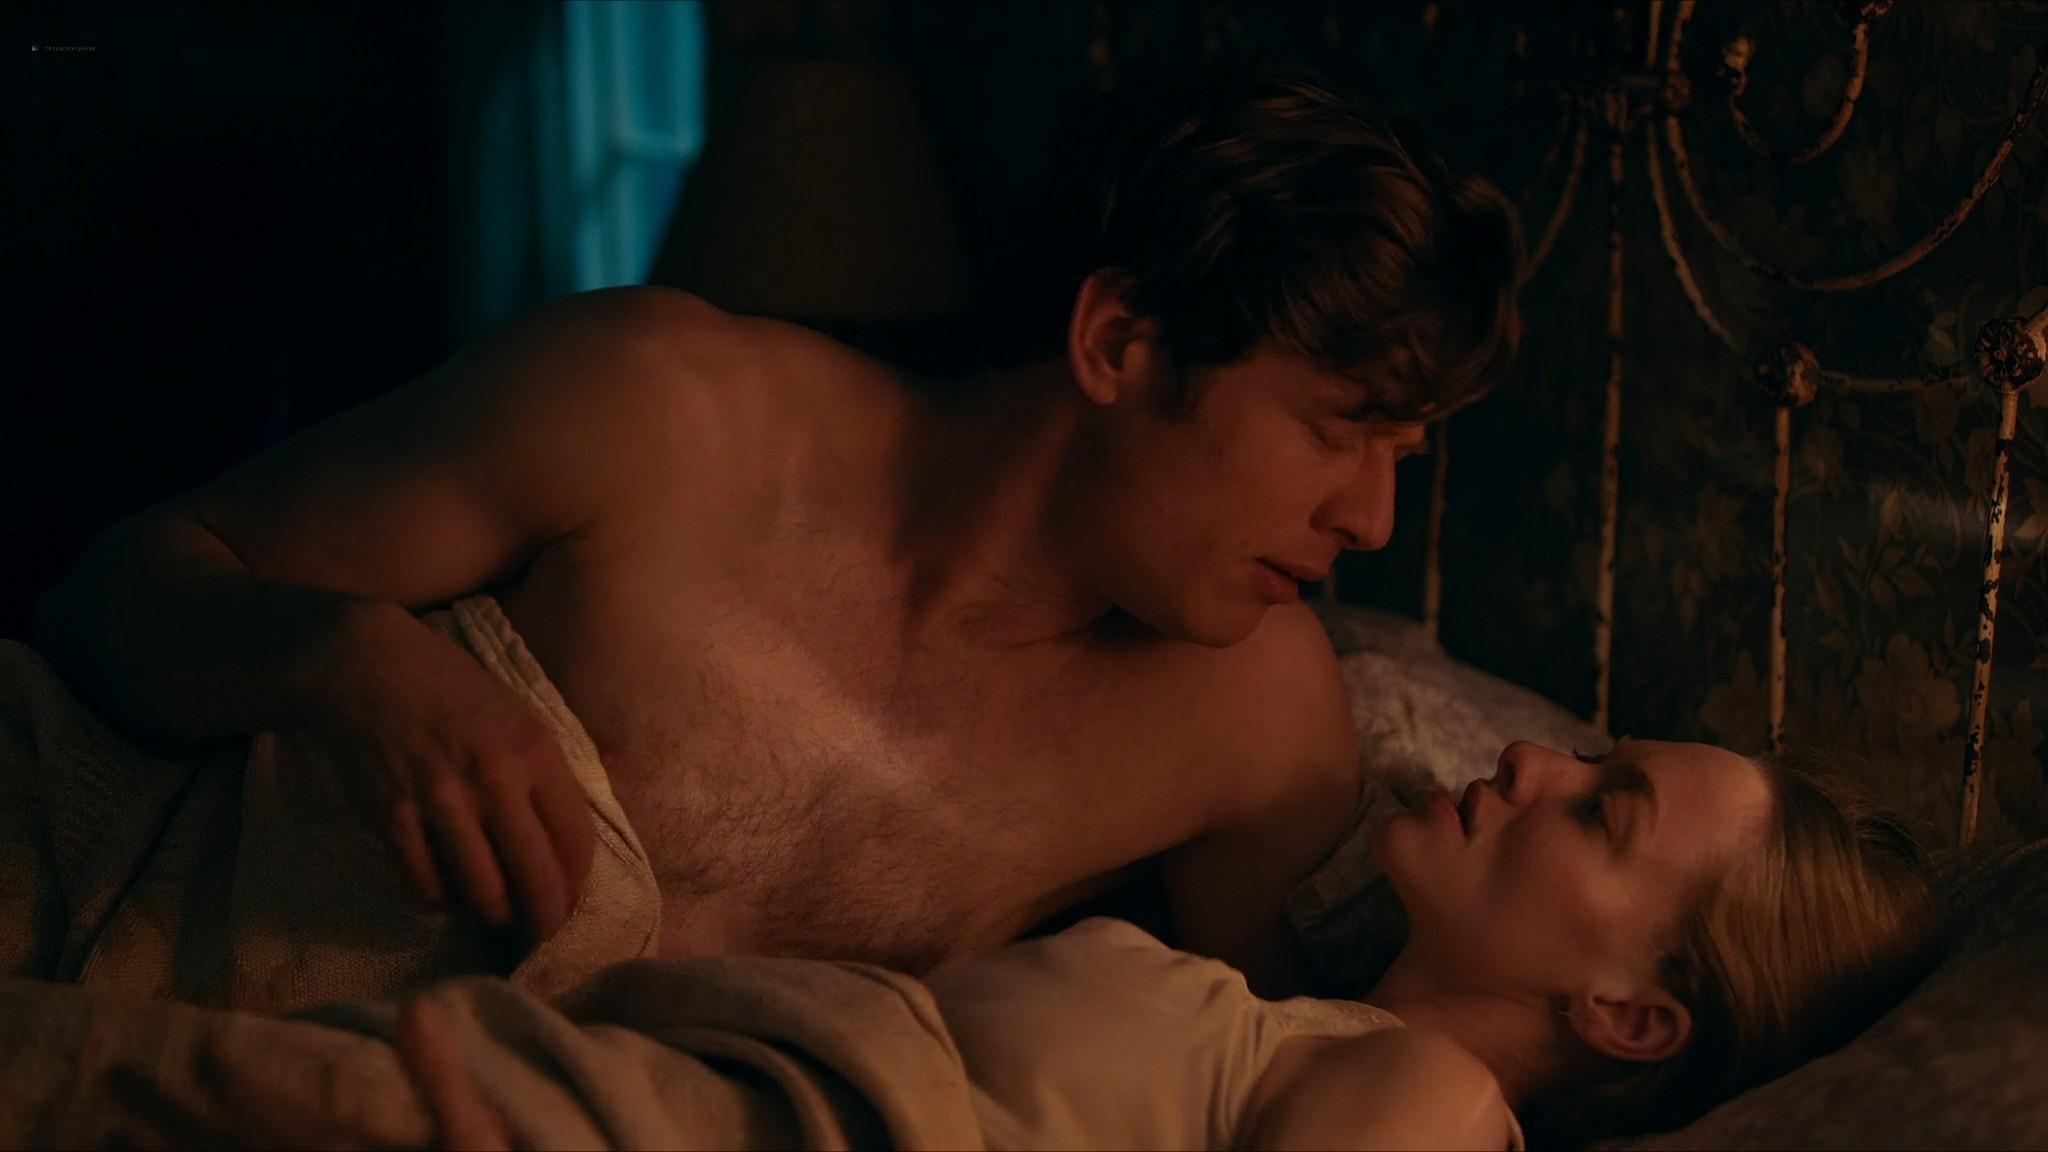 Amanda Seyfried hot Natalia Dyer sexy Things Heard Seen 2021 1080p Web 2